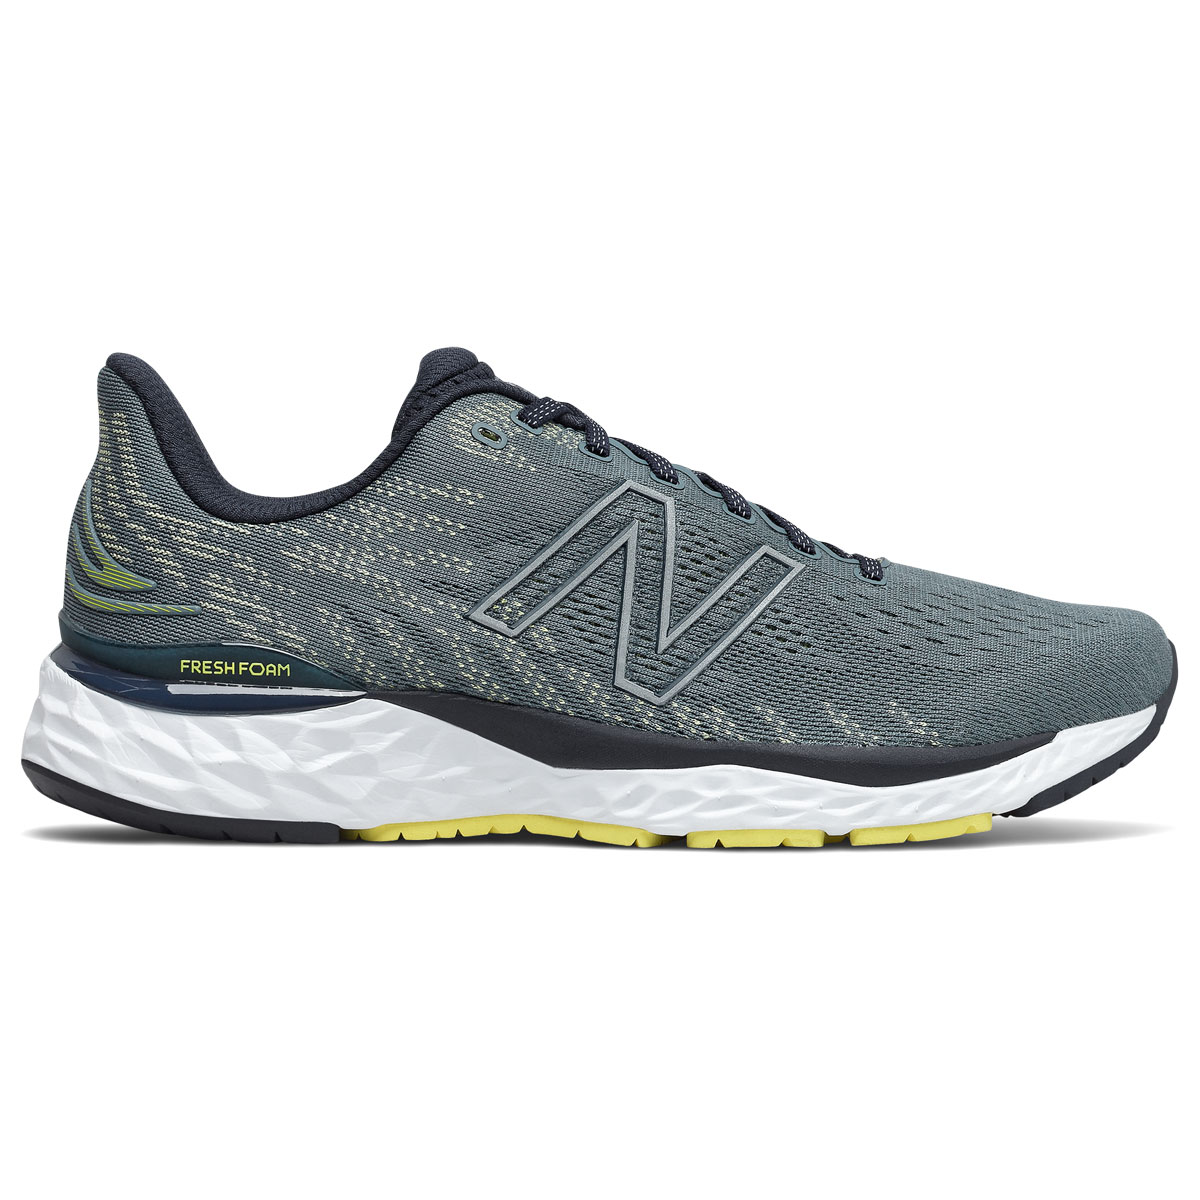 Men's New Balance Fresh Foam 880v11 Running Shoe - Color: Ocean Grey/First Light - Size: 7 - Width: Wide, Ocean Grey/First Light, large, image 1